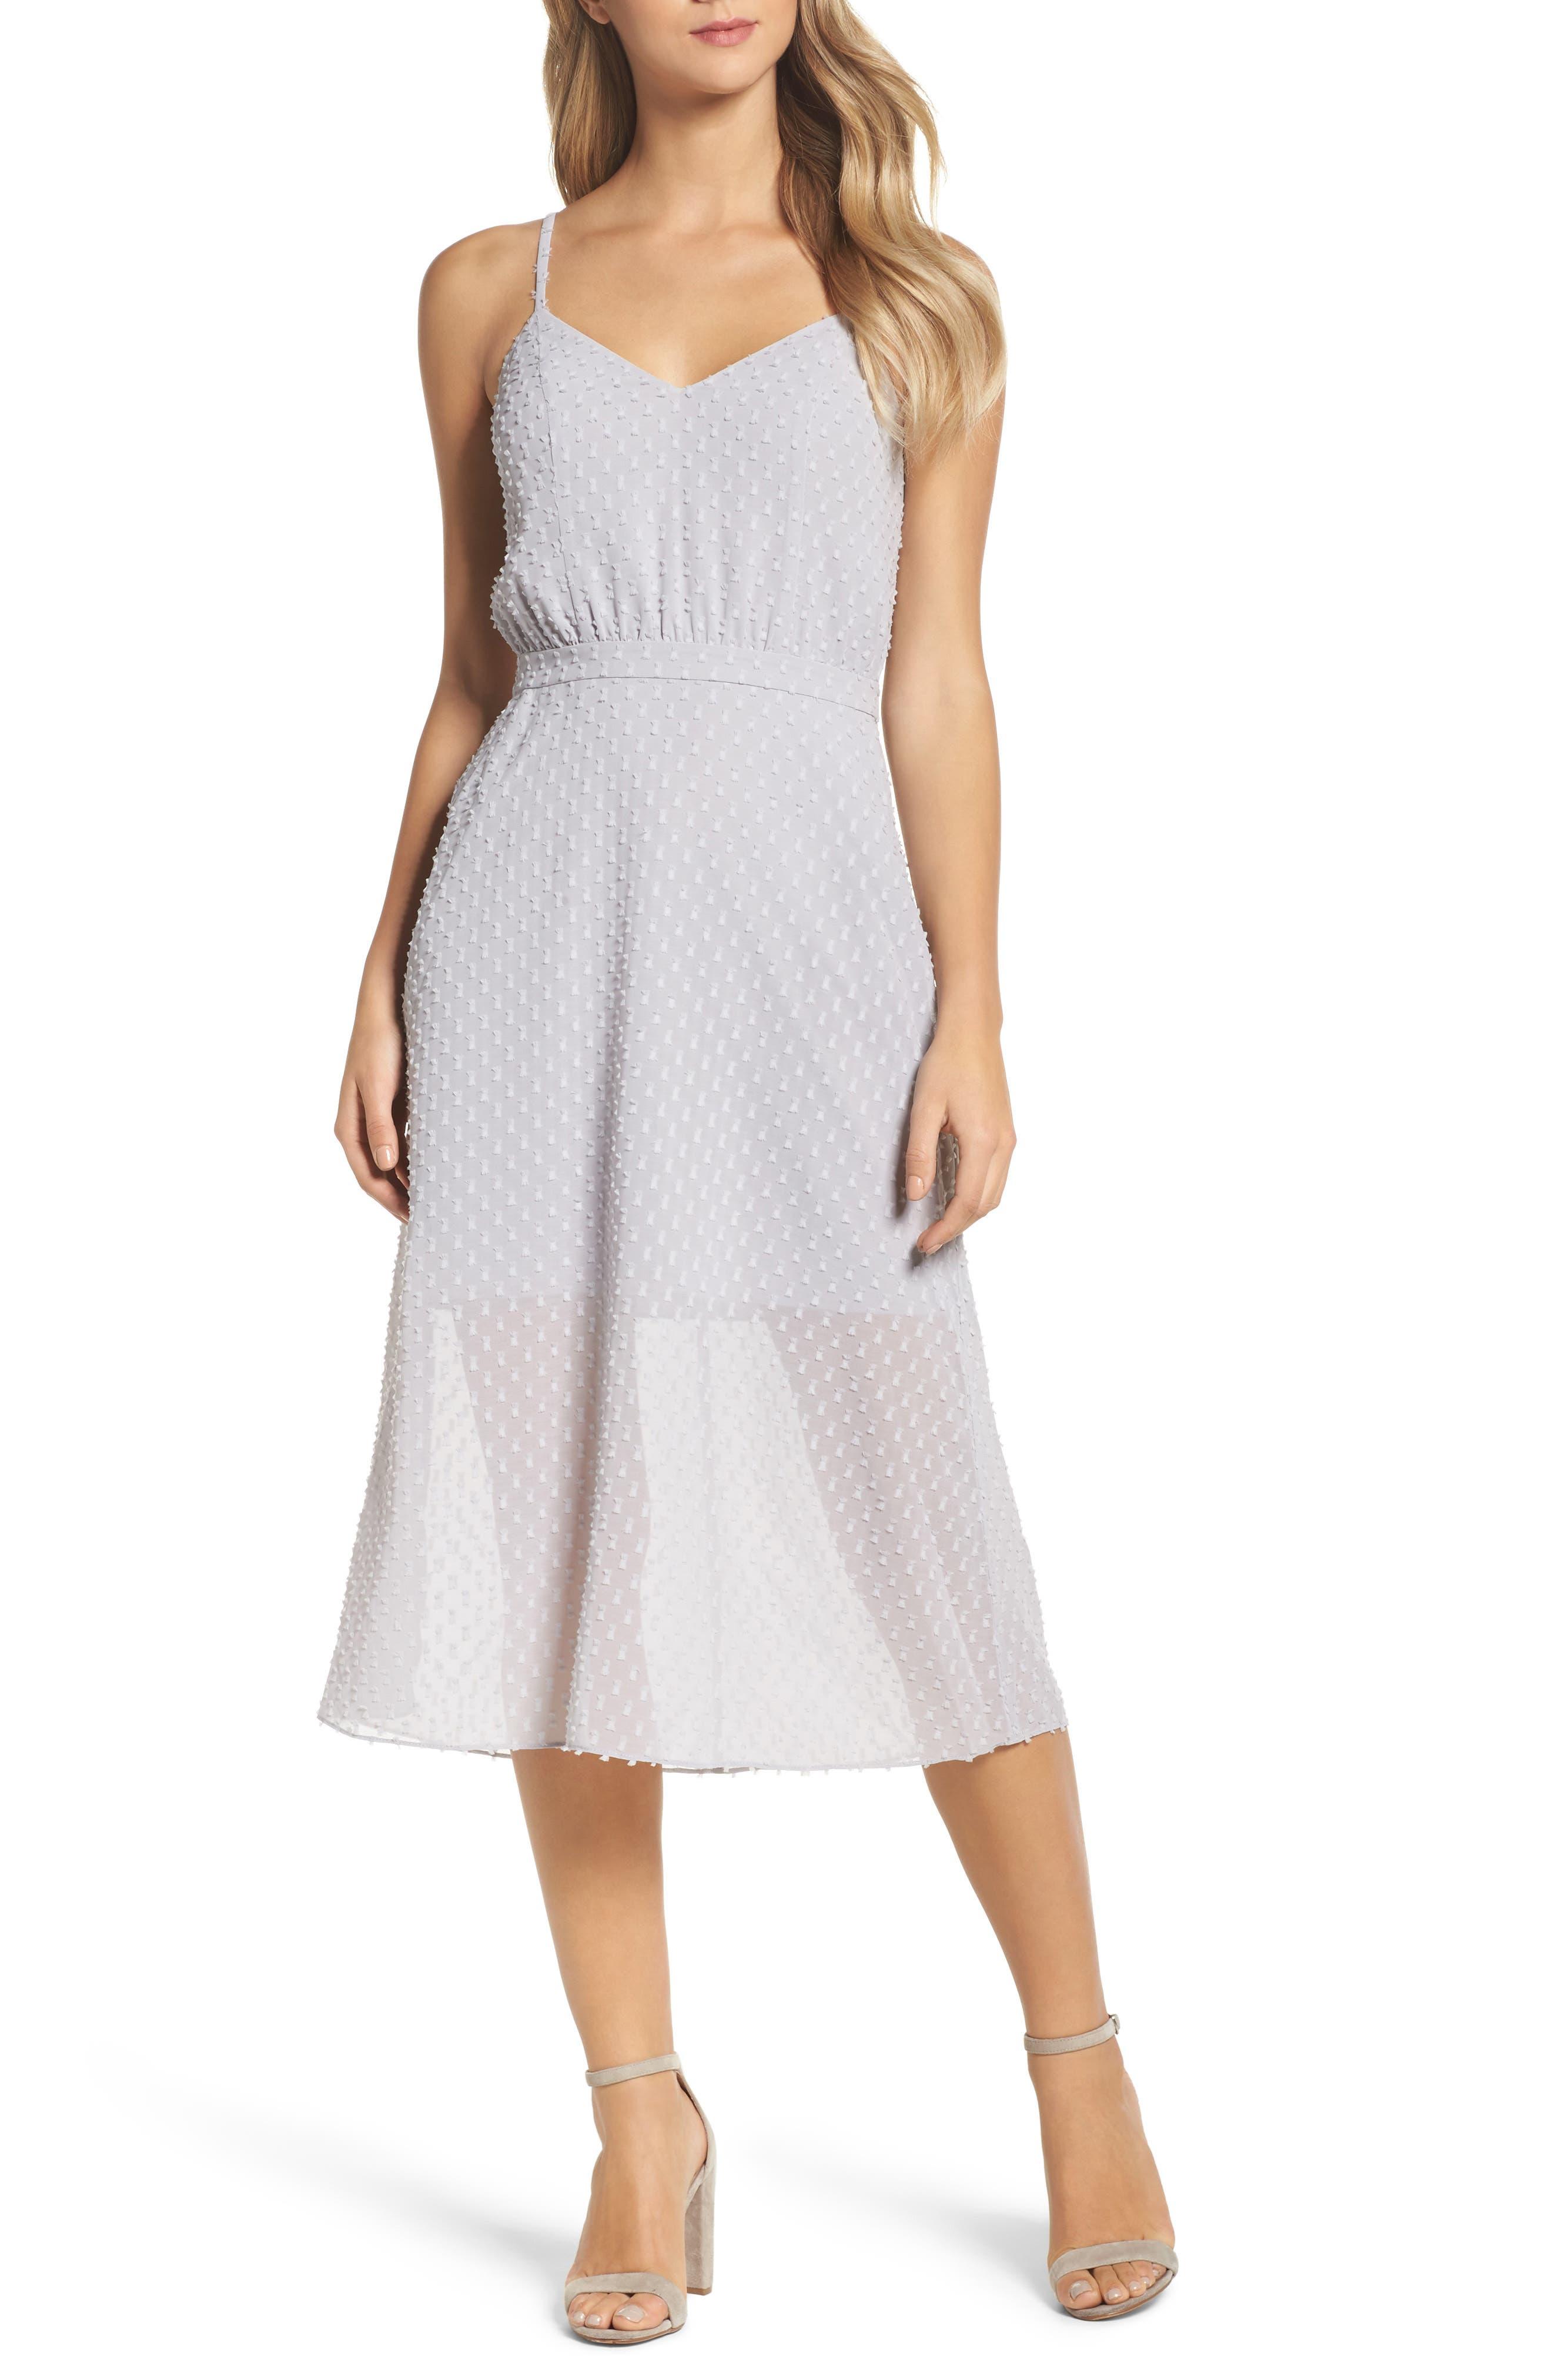 Bisou Bisou Midi Dress,                         Main,                         color, 020